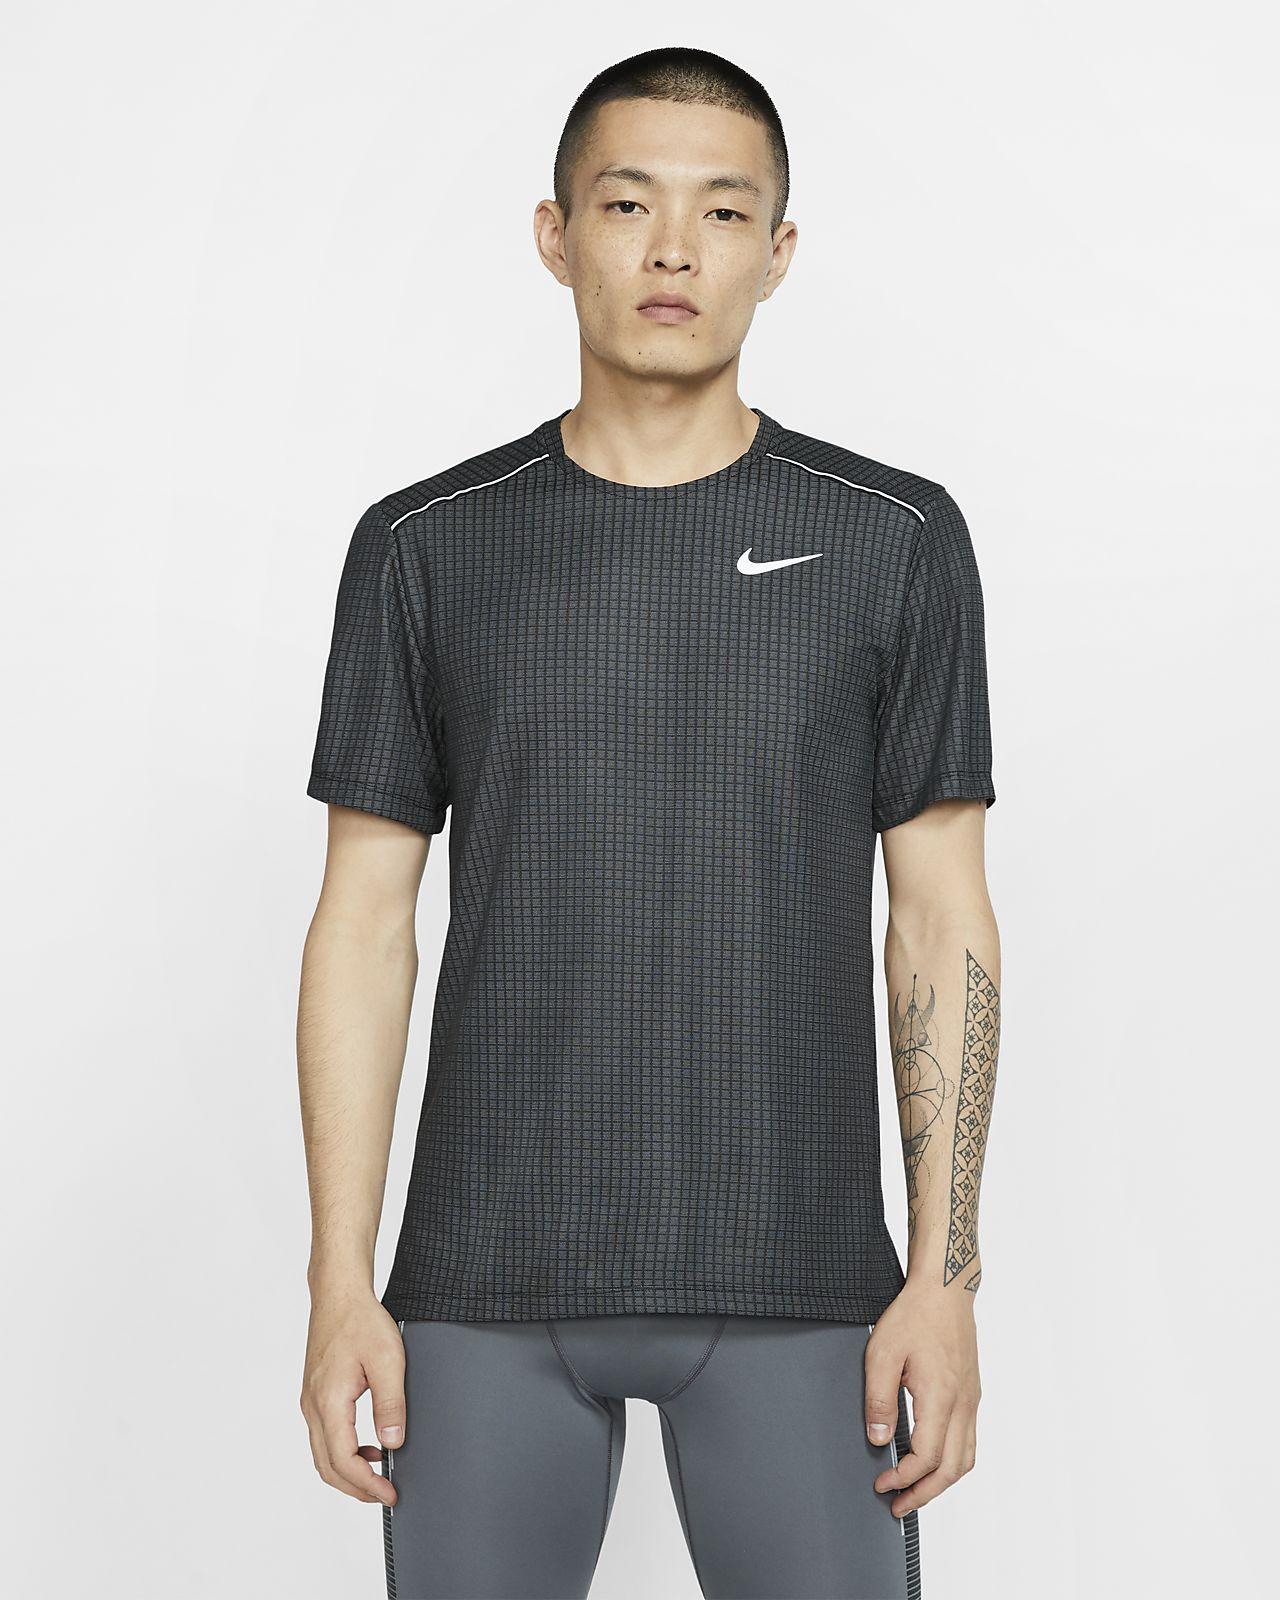 Мужская беговая футболка с коротким рукавом Nike Miler